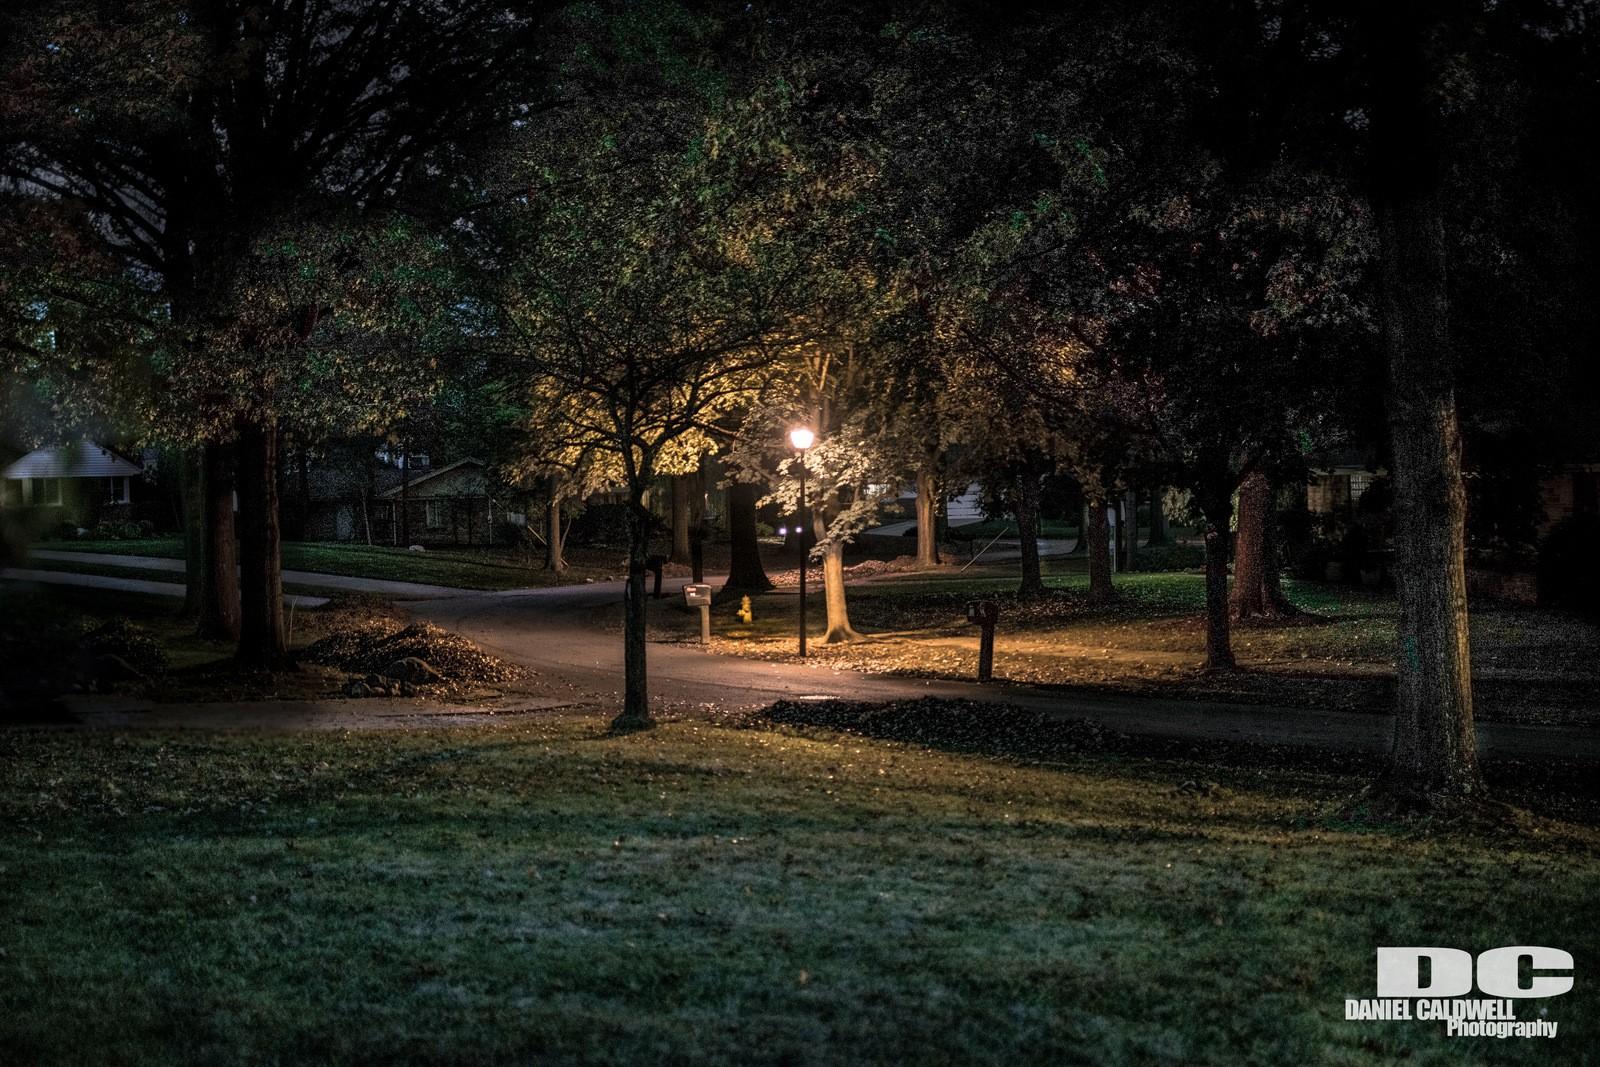 Night time neighborhood | ThePhotoForum: Film & Digital